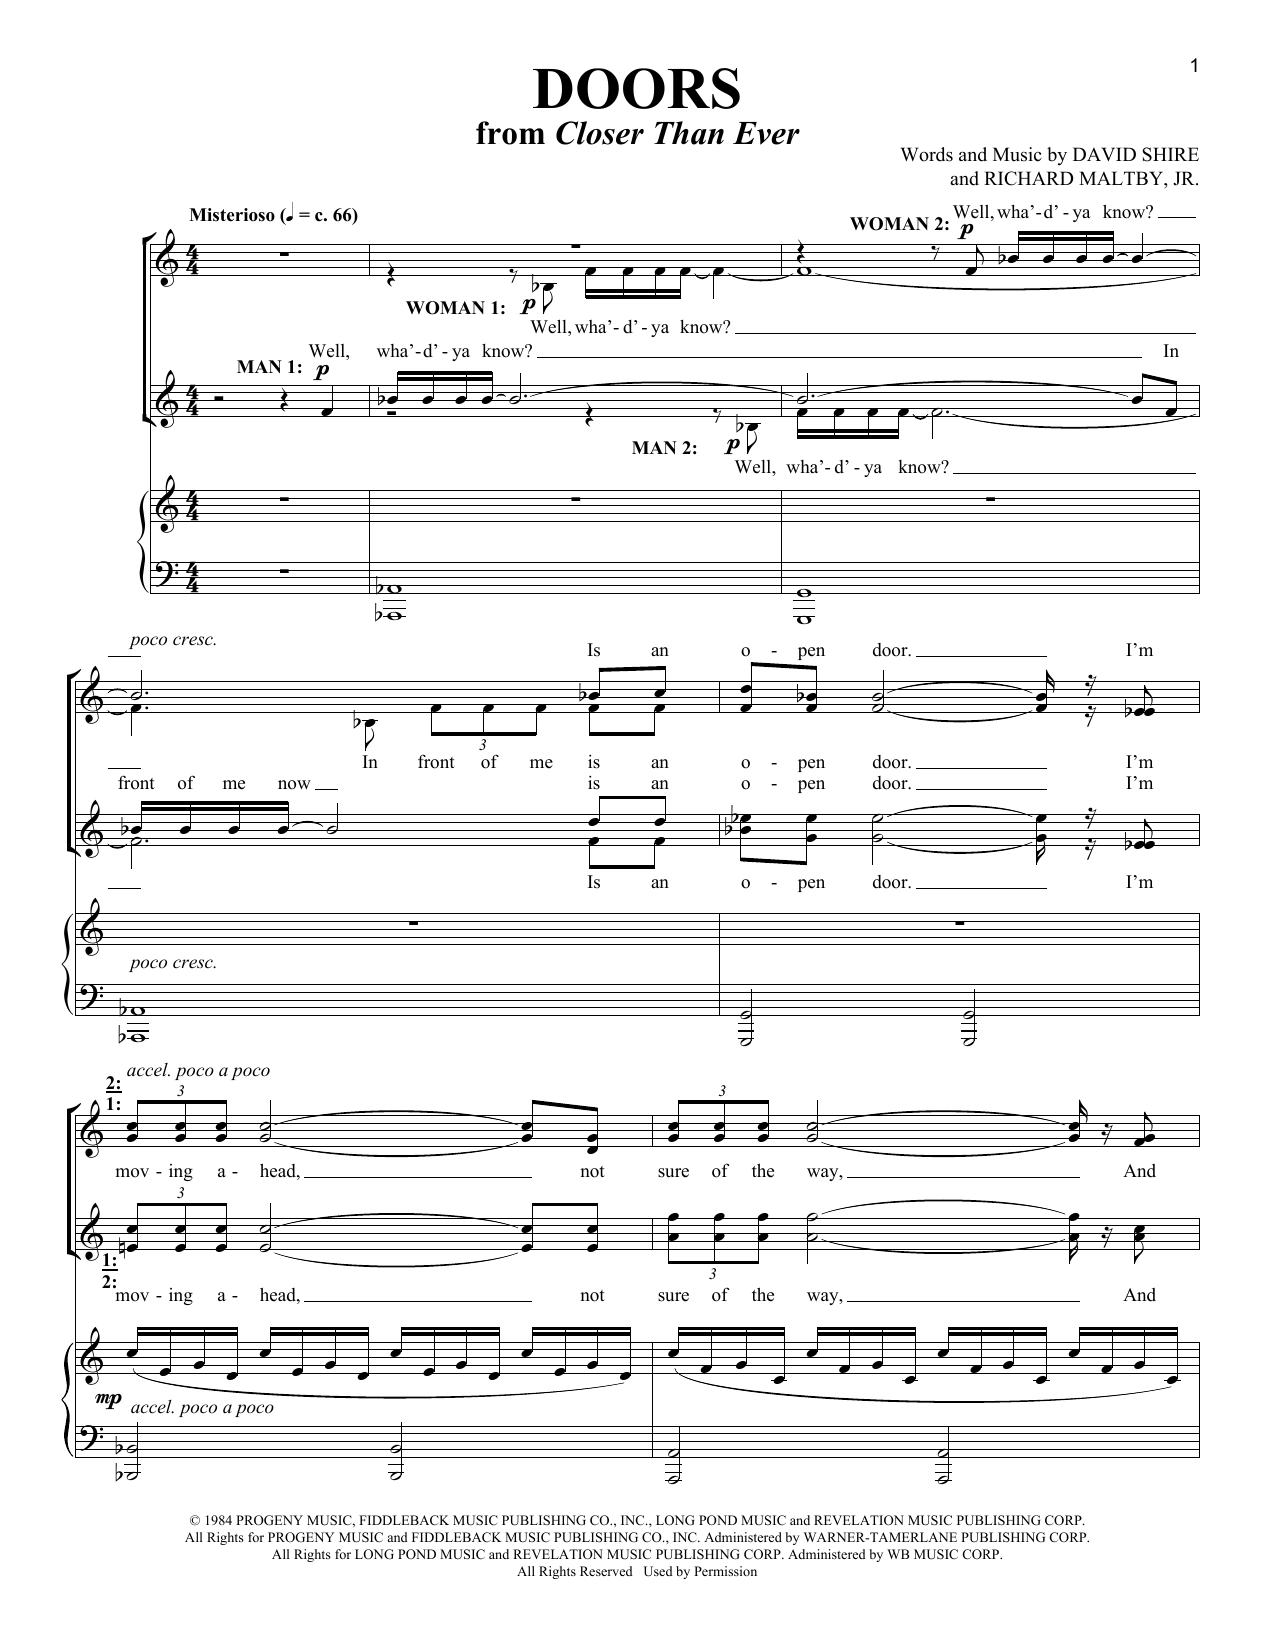 Richard Maltby, Jr. Doors sheet music notes and chords. Download Printable PDF.